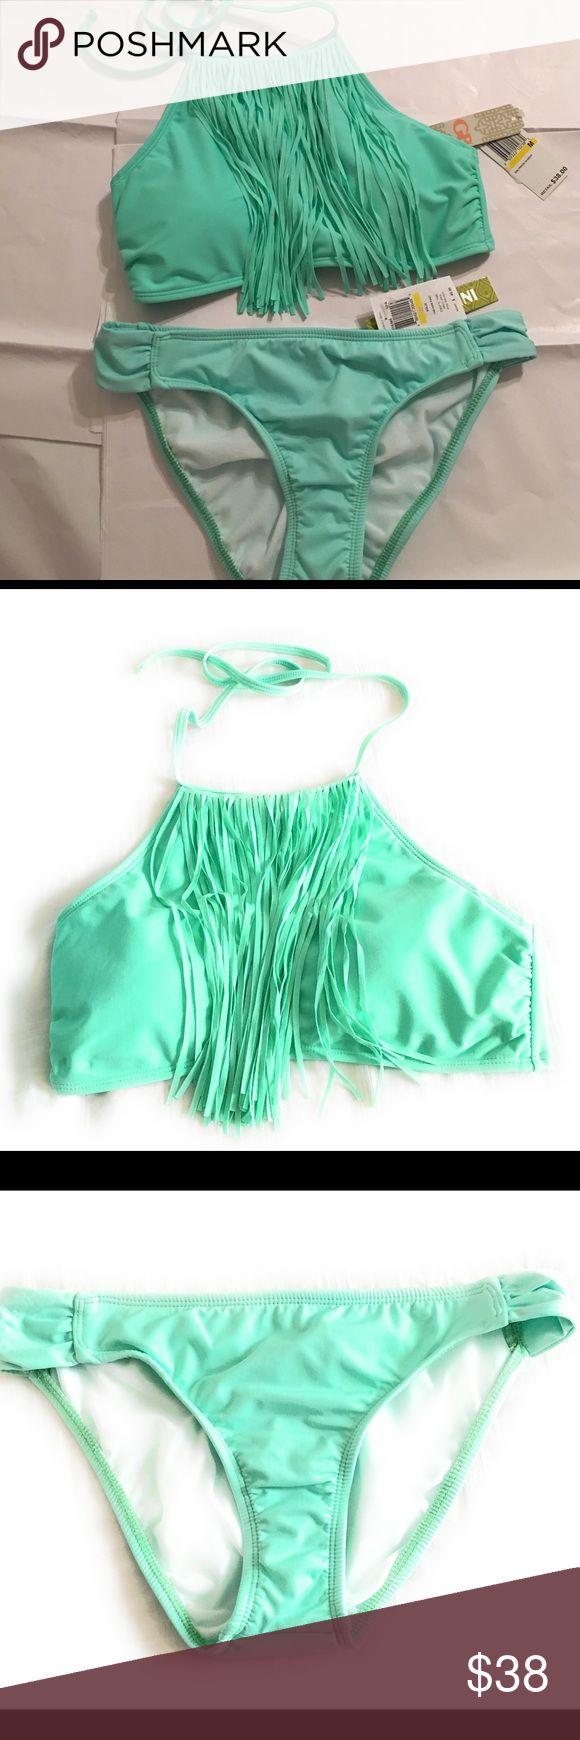 Gianni Bini Women's Solid Fringe High Neck  Set Gianni Bini Women's Solid Fringe High Neck Bikini  set Medium- Green Gianni Bini Swim Bikinis